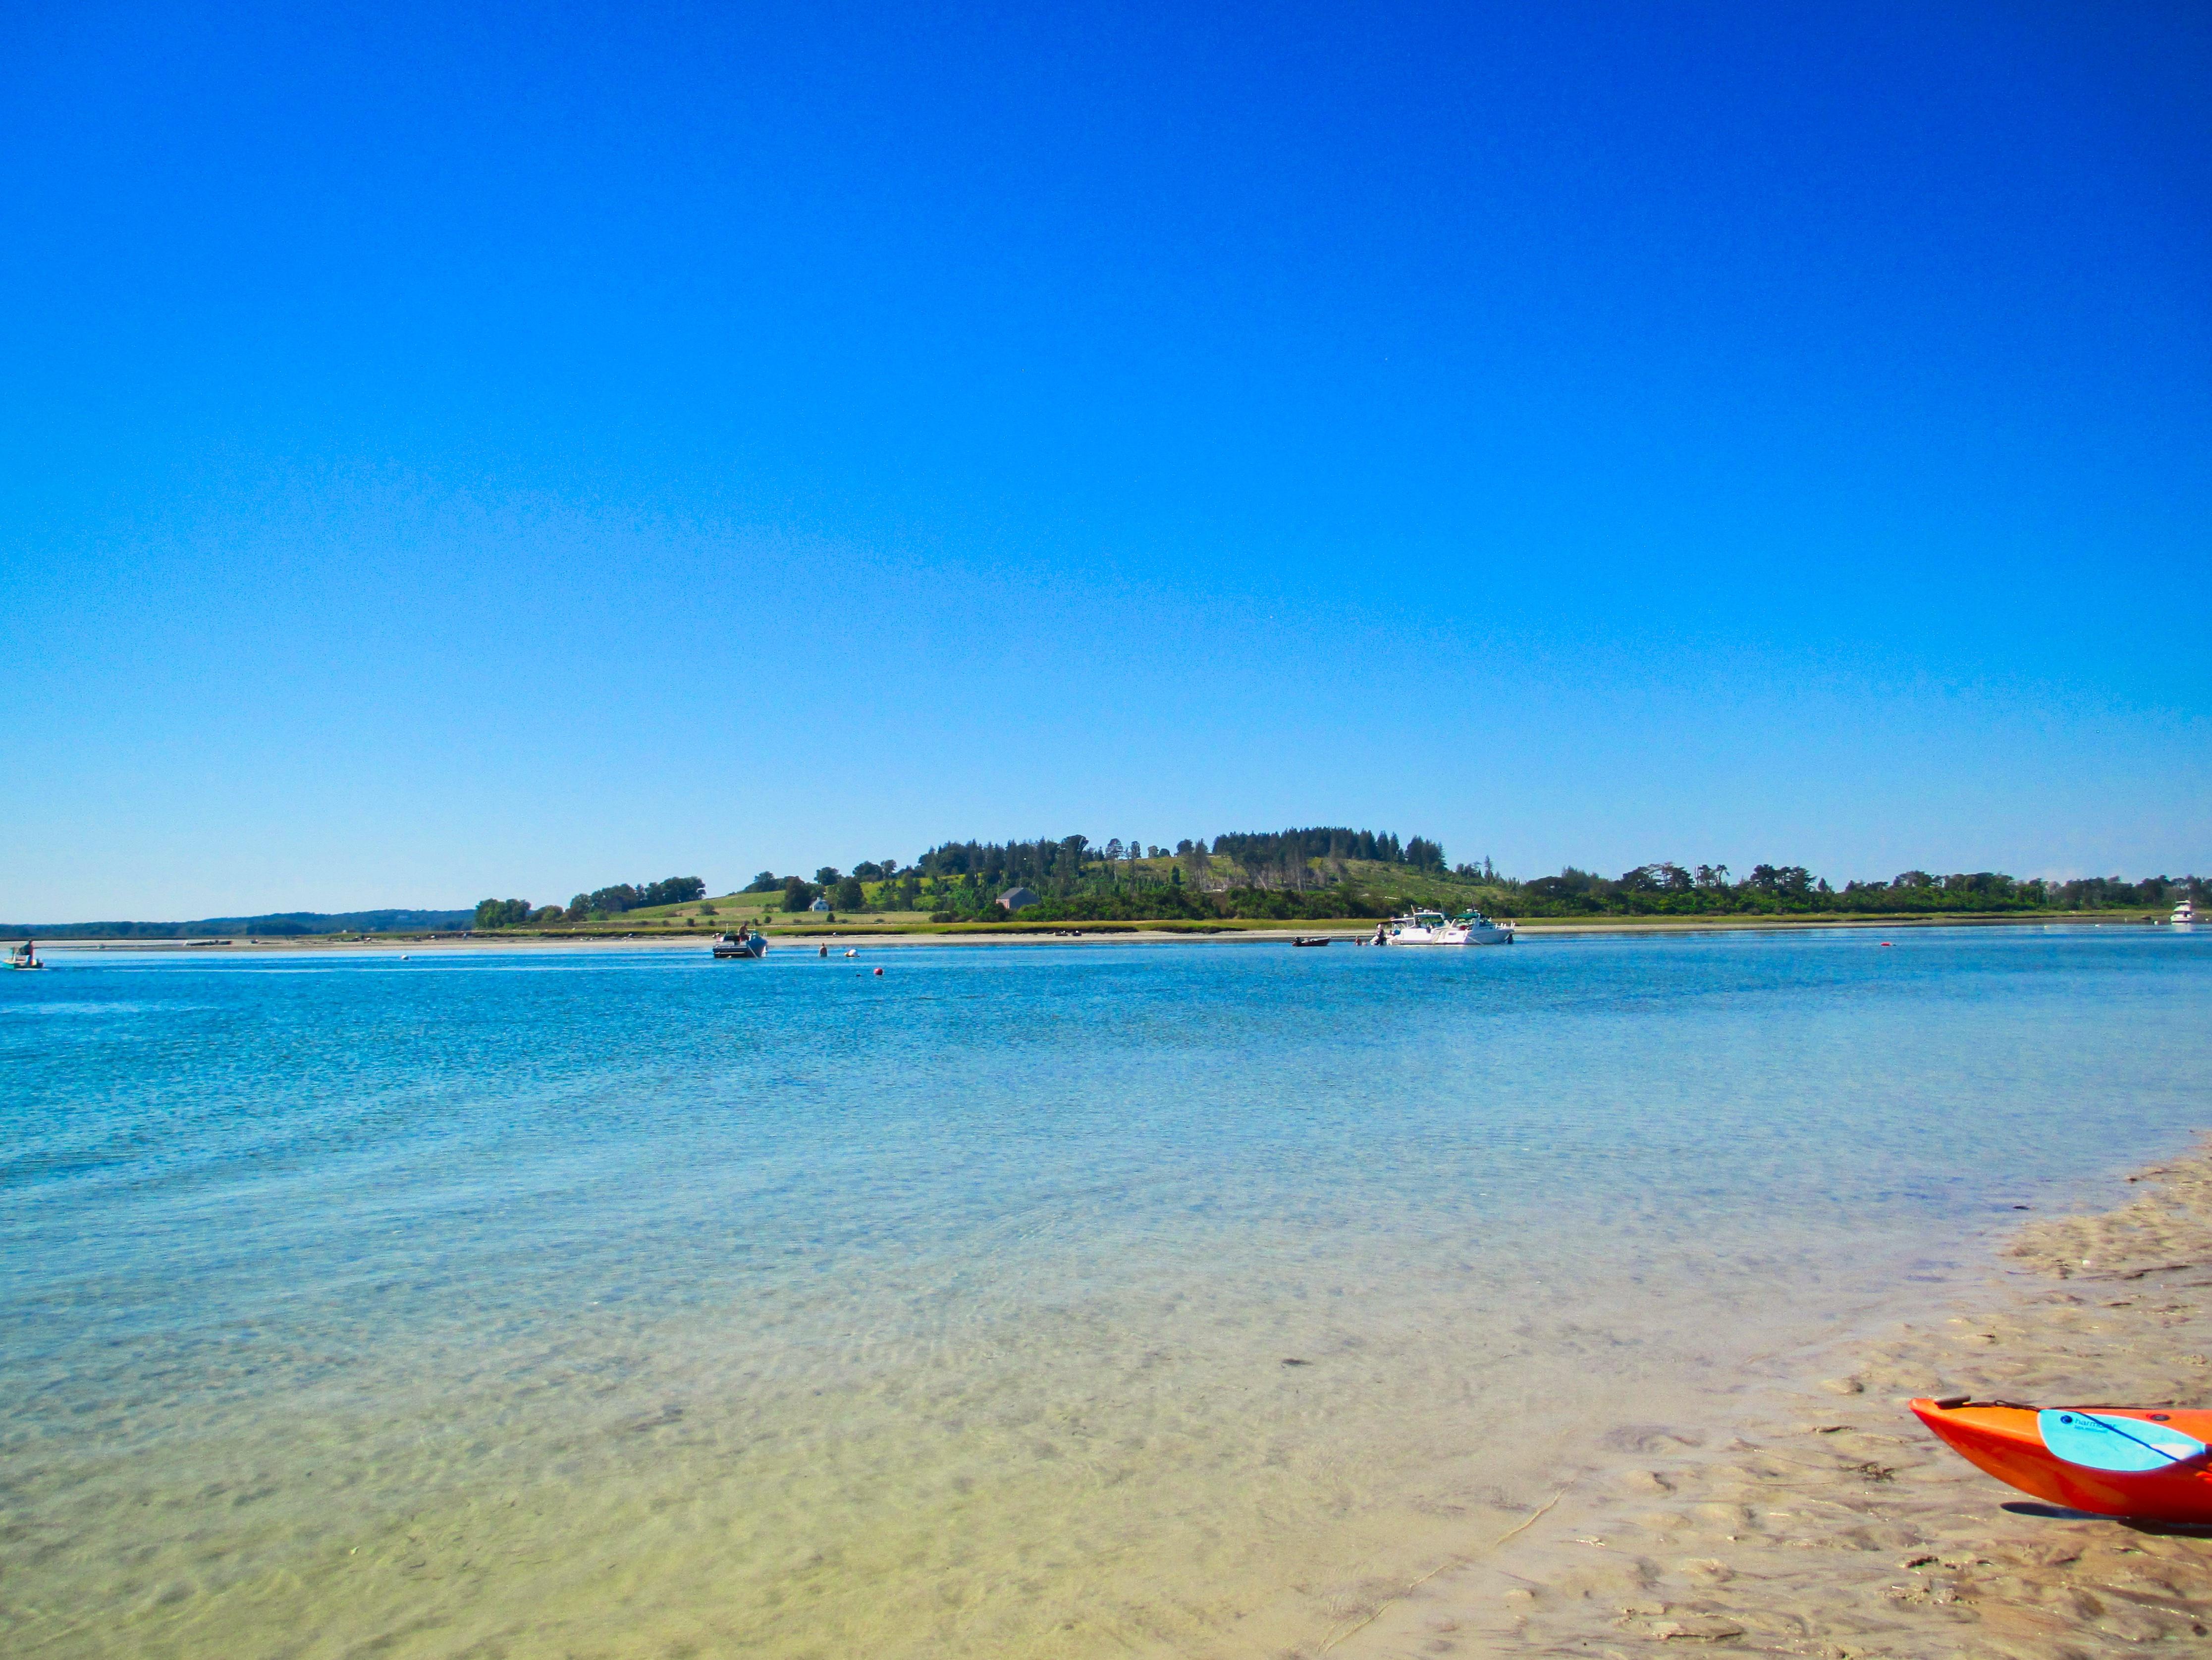 Kayaking-to-Crane-Beach-and-Choate-Island